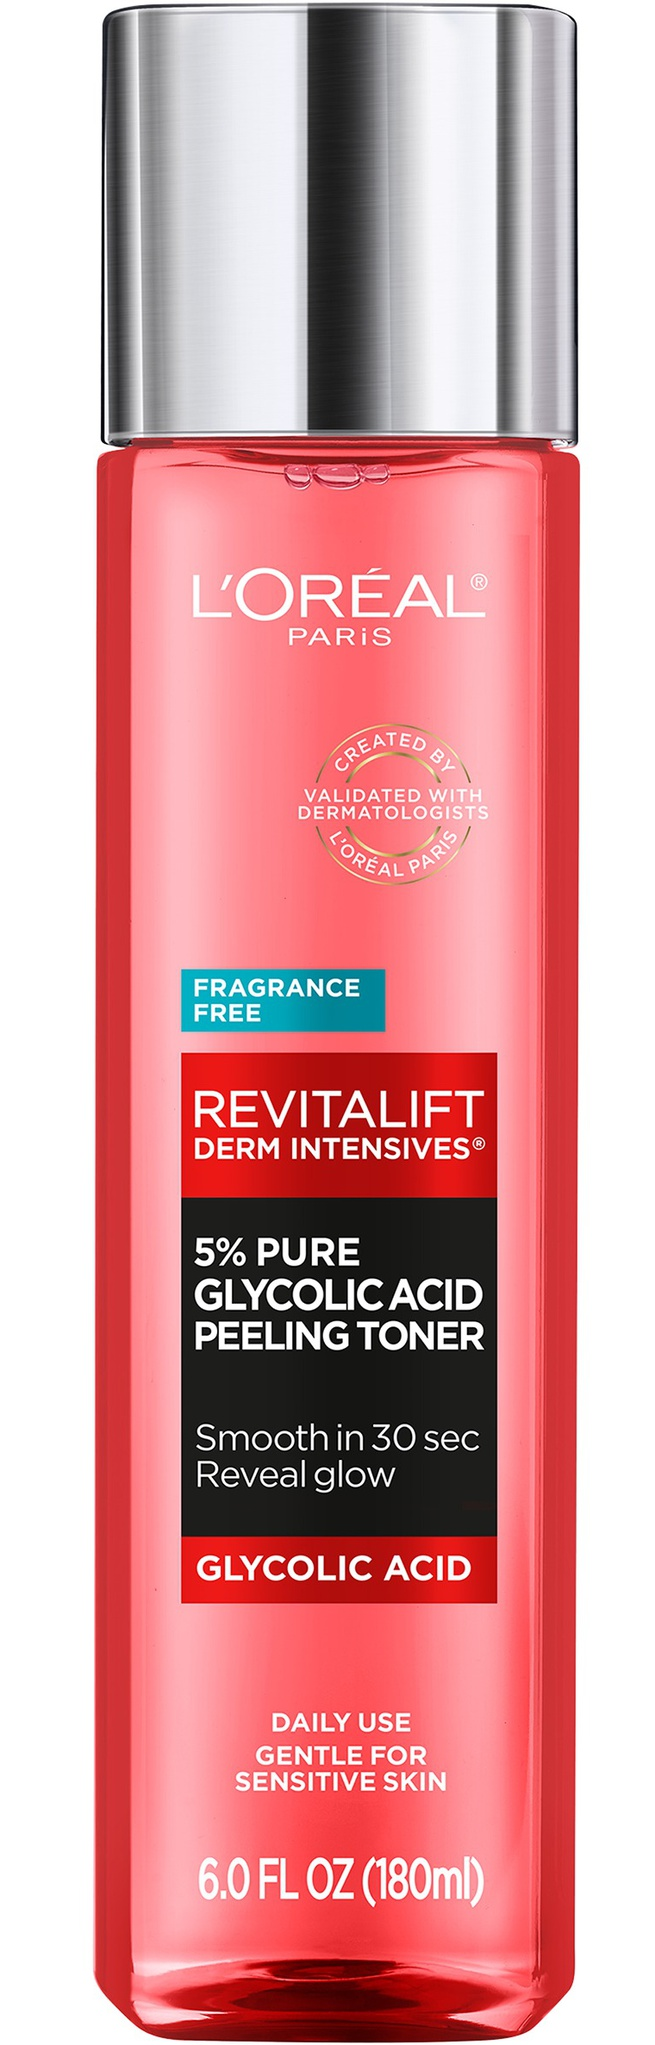 L'Oreal Paris Derm Intensives Revitalift 5% Pure Glycolic Acid Peeling Toner